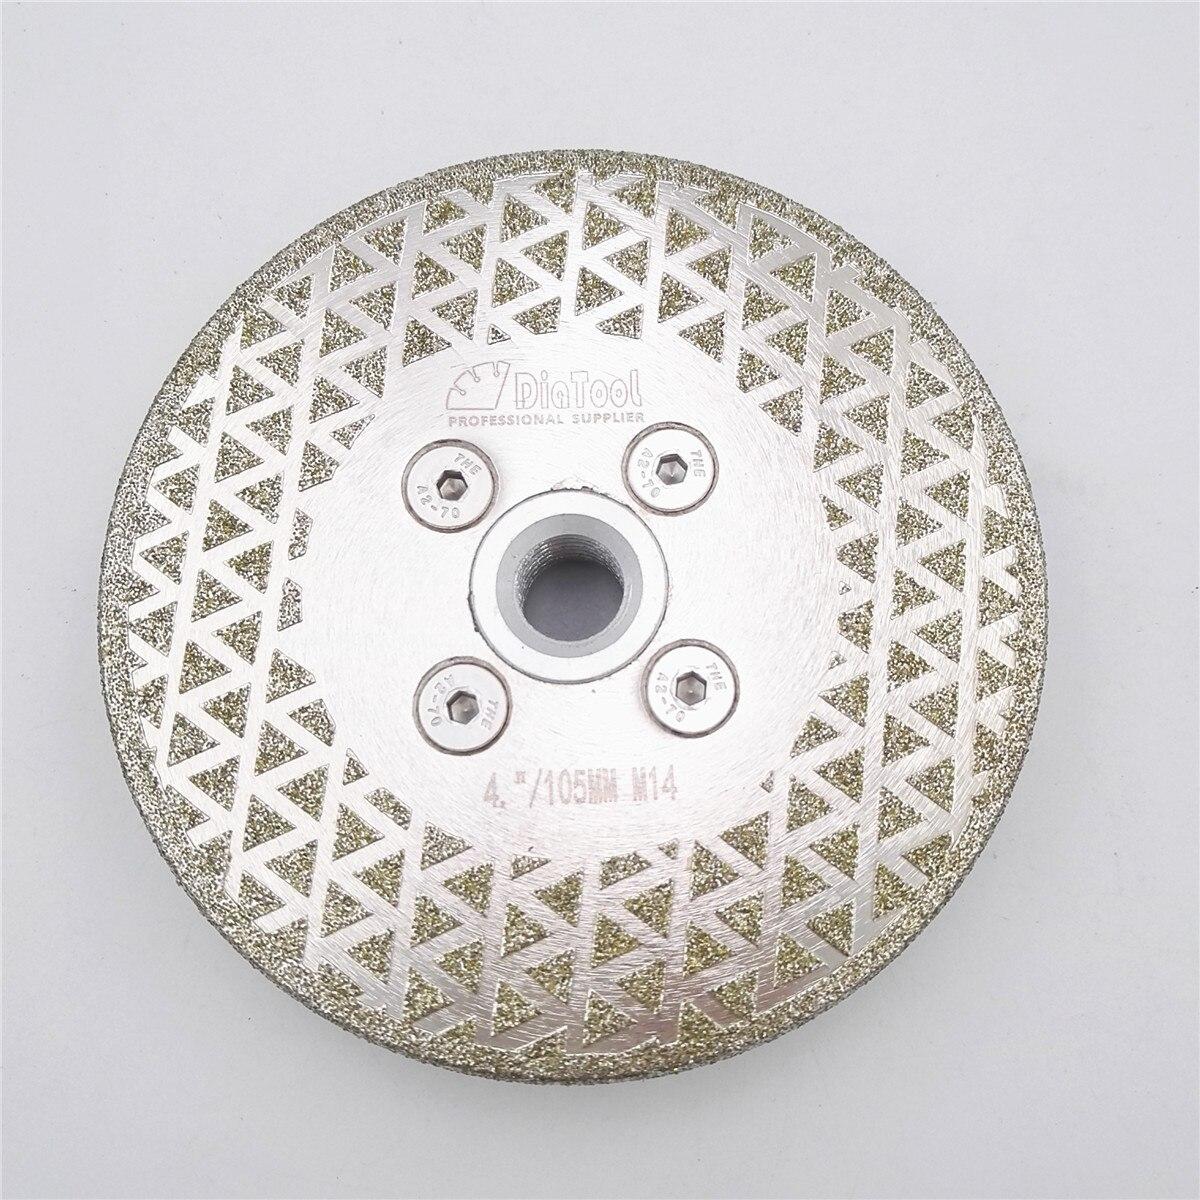 DIATOOL 1pc Electroplated Diamond Cutting & Grinding Blade M14 Thread Marble Single Side Coated Diamond disc